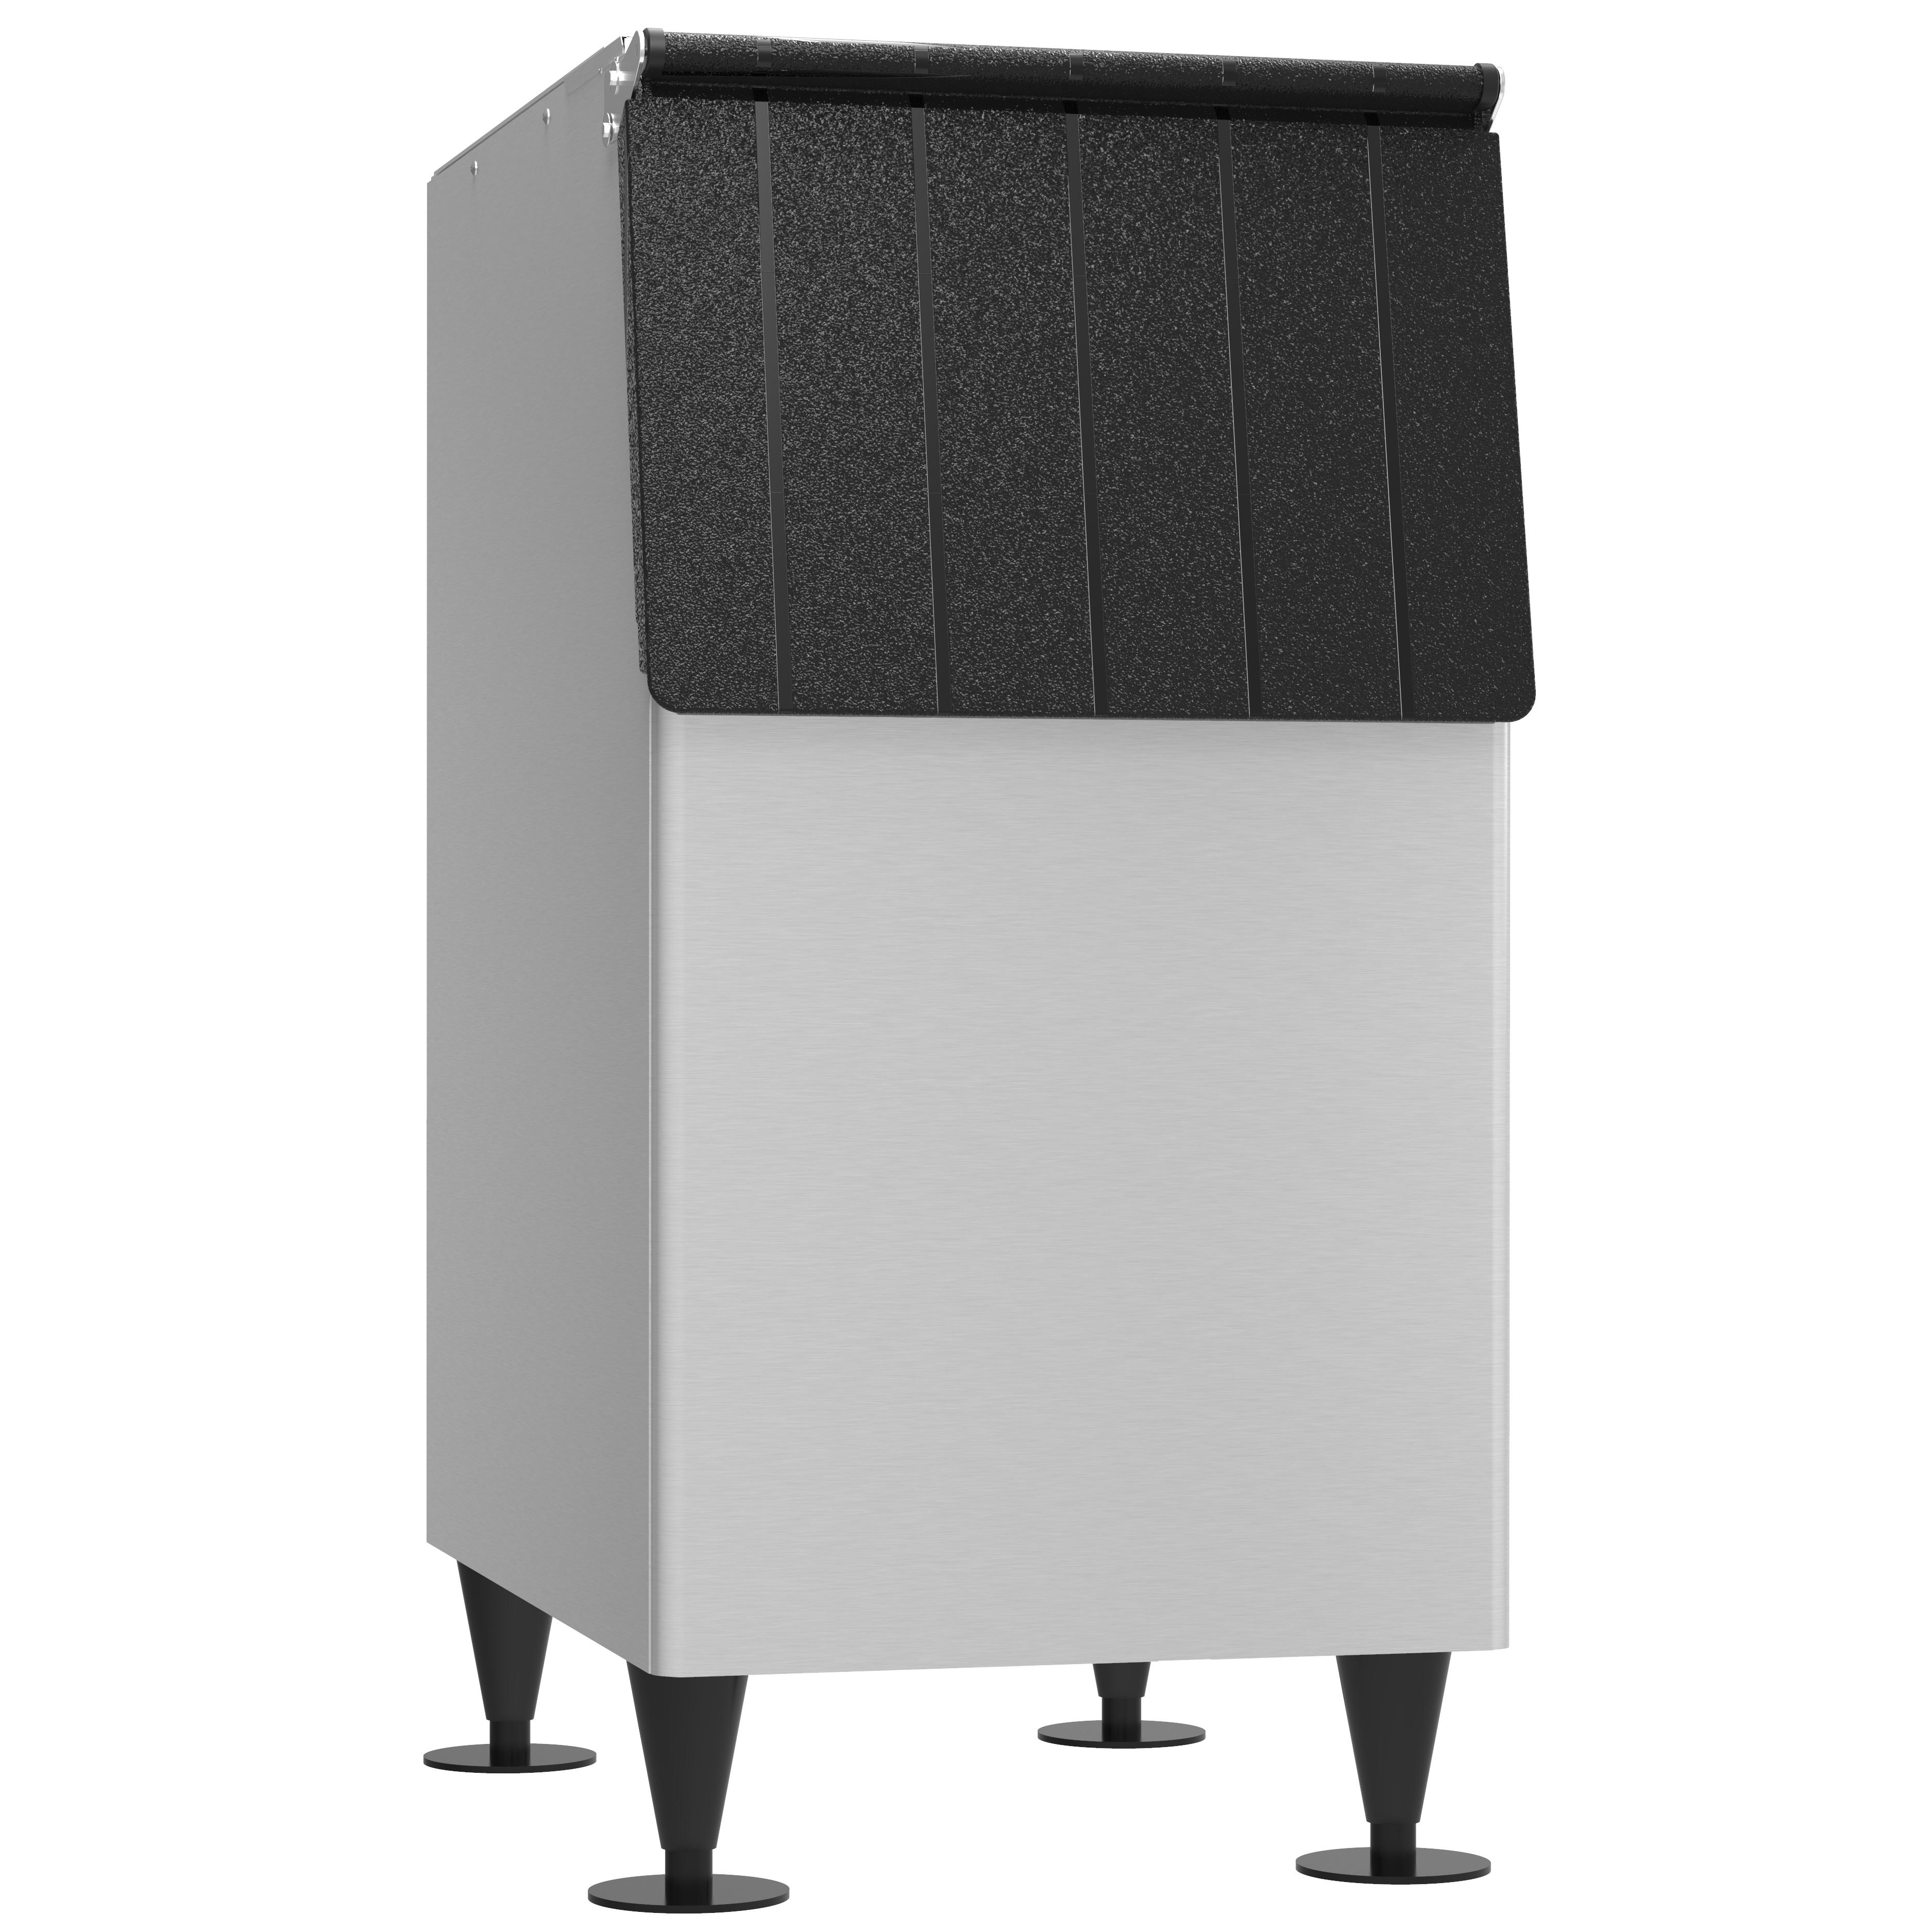 Hoshizaki B-300SF ice cubers, ice storage & ice dispensers